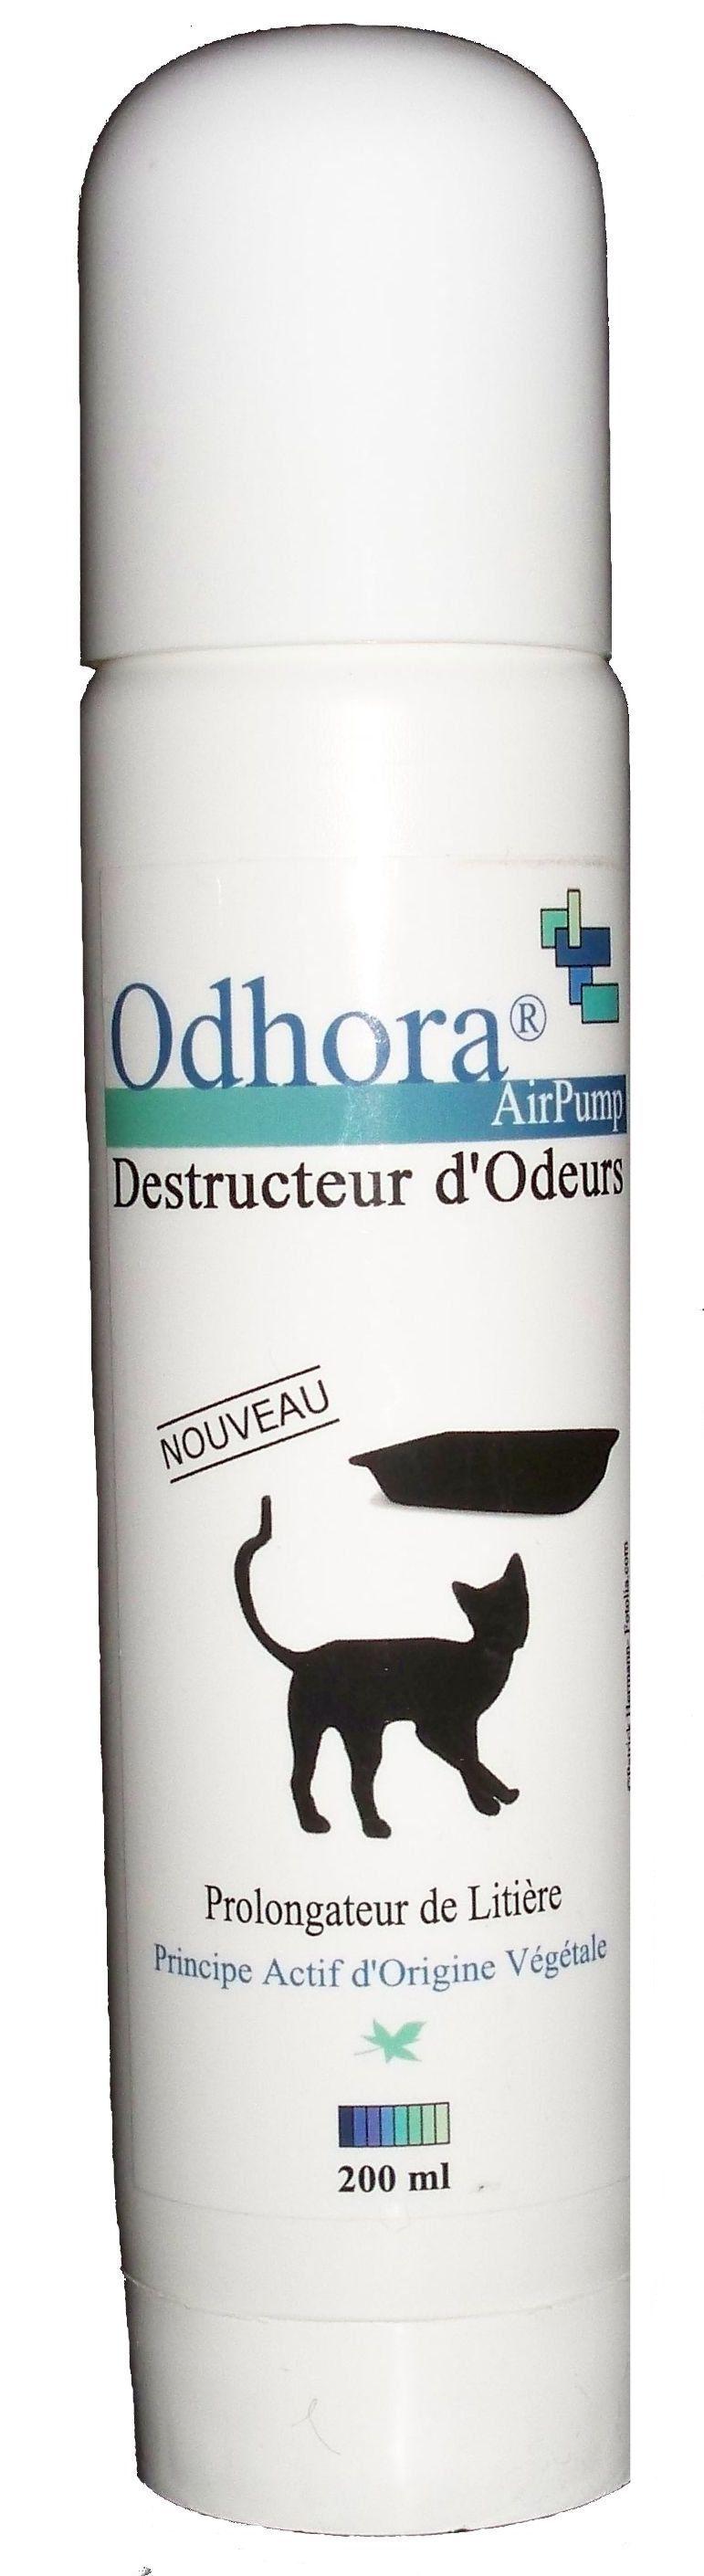 Produits anti-odeurs d'animaux